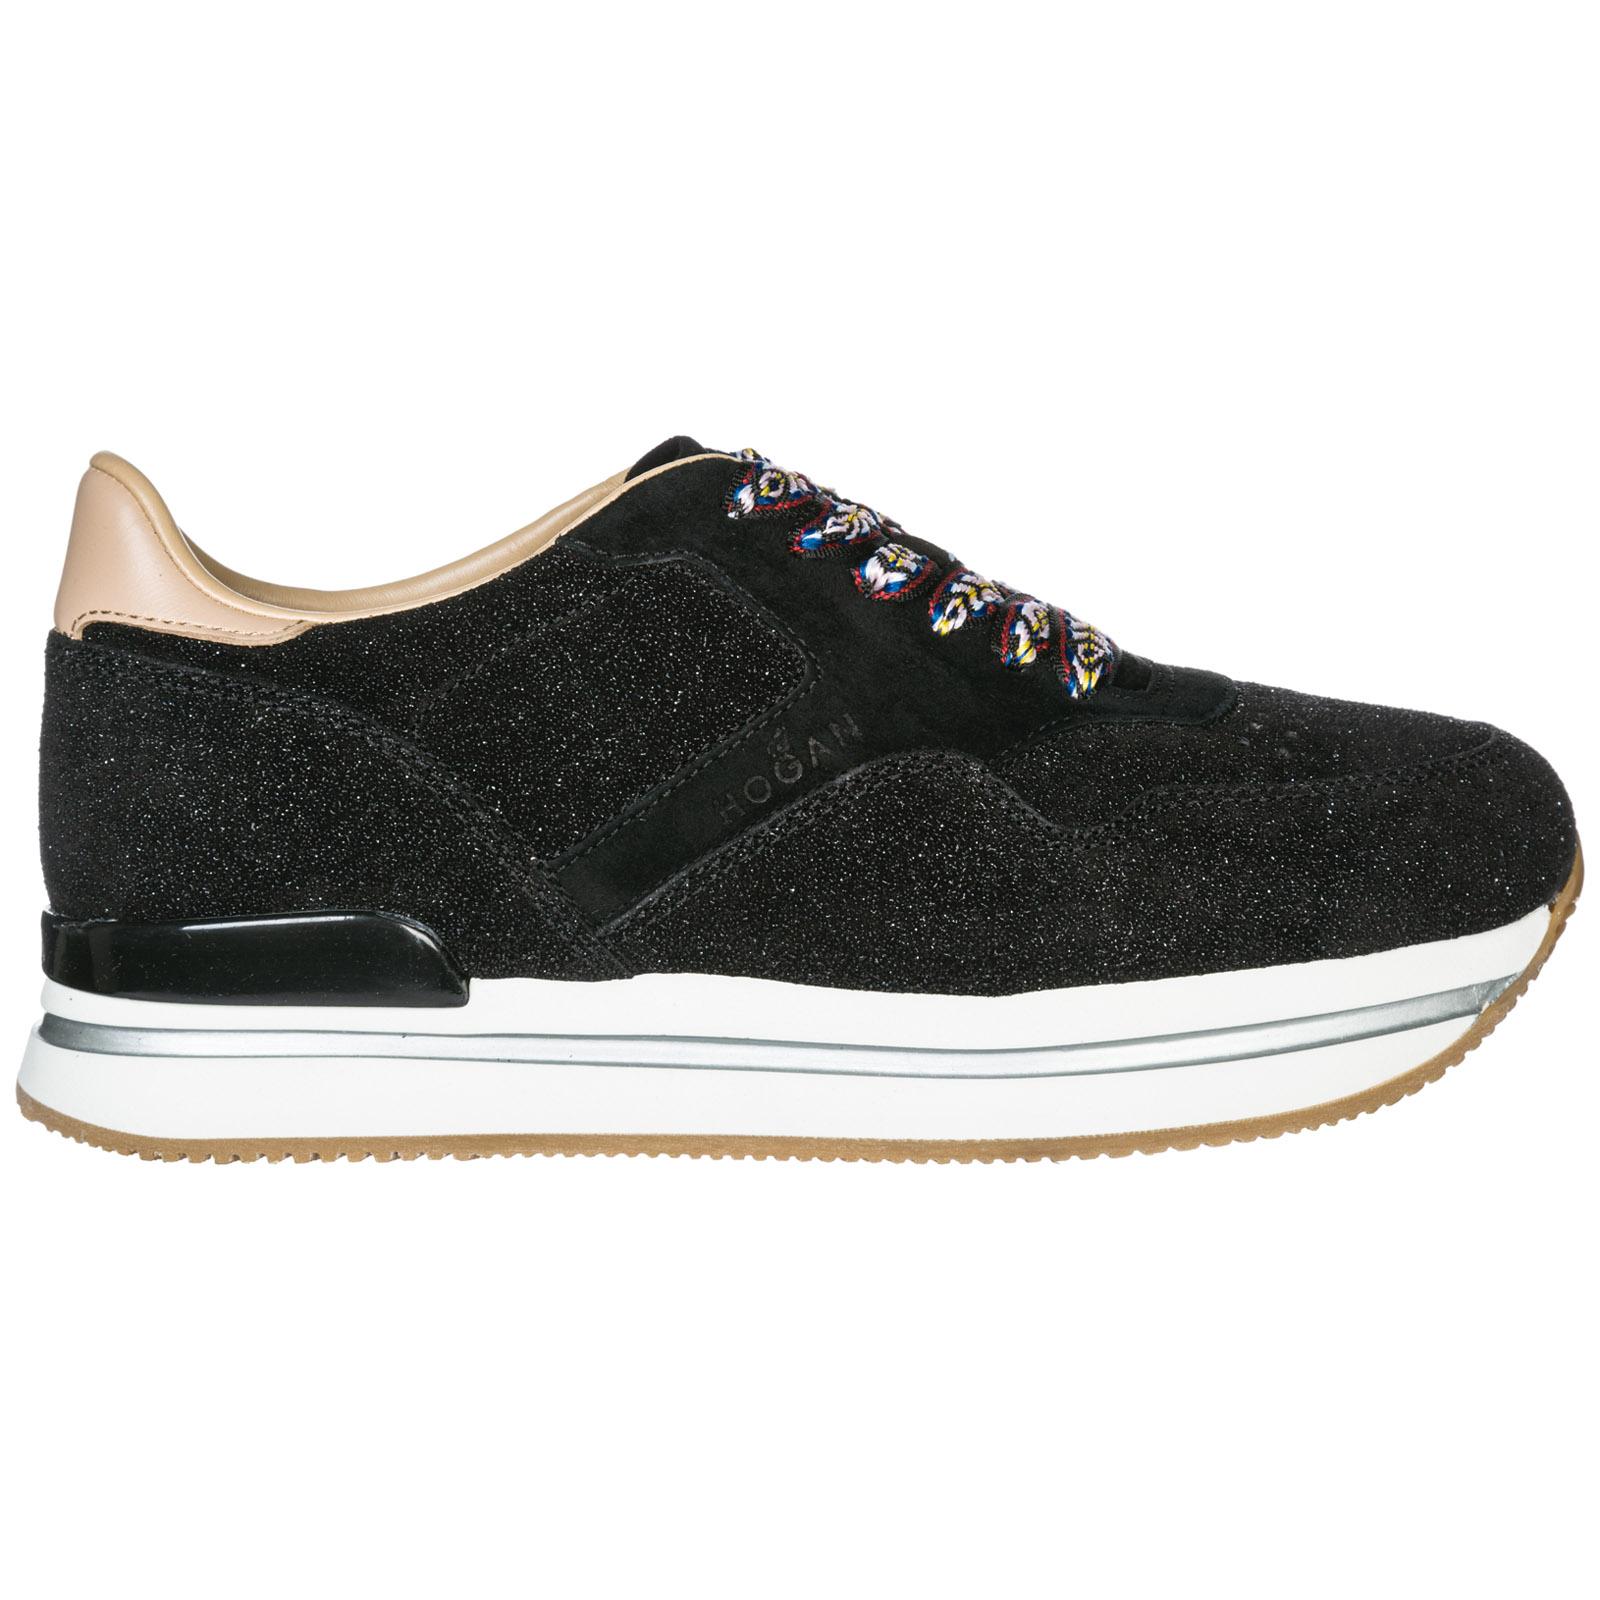 a12f08b9e Sneakers Hogan H222 HXW2220M468JDJ079X nero   FRMODA.com